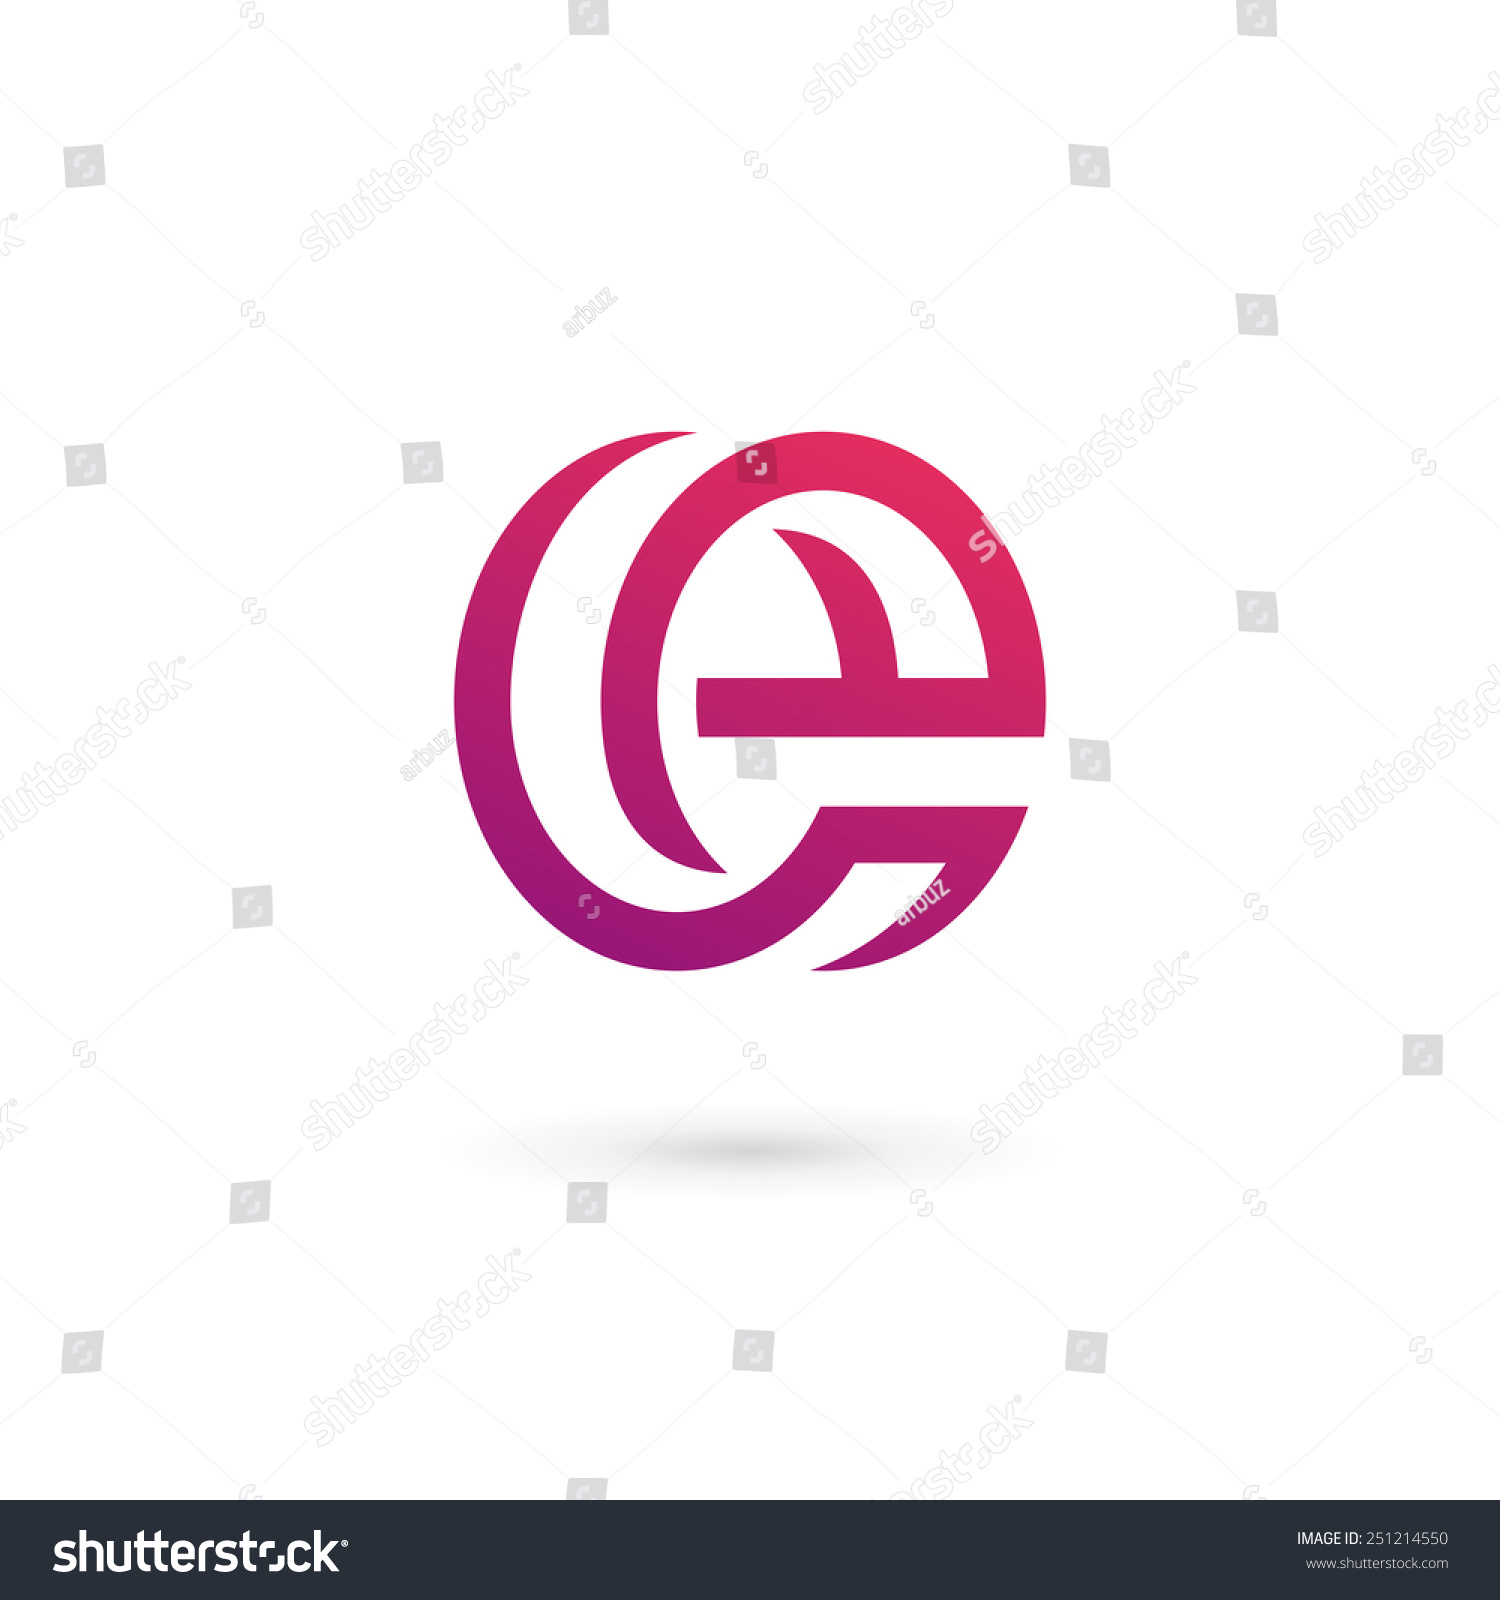 letter e logo icon design template stock vector 251214550 shutterstock. Black Bedroom Furniture Sets. Home Design Ideas